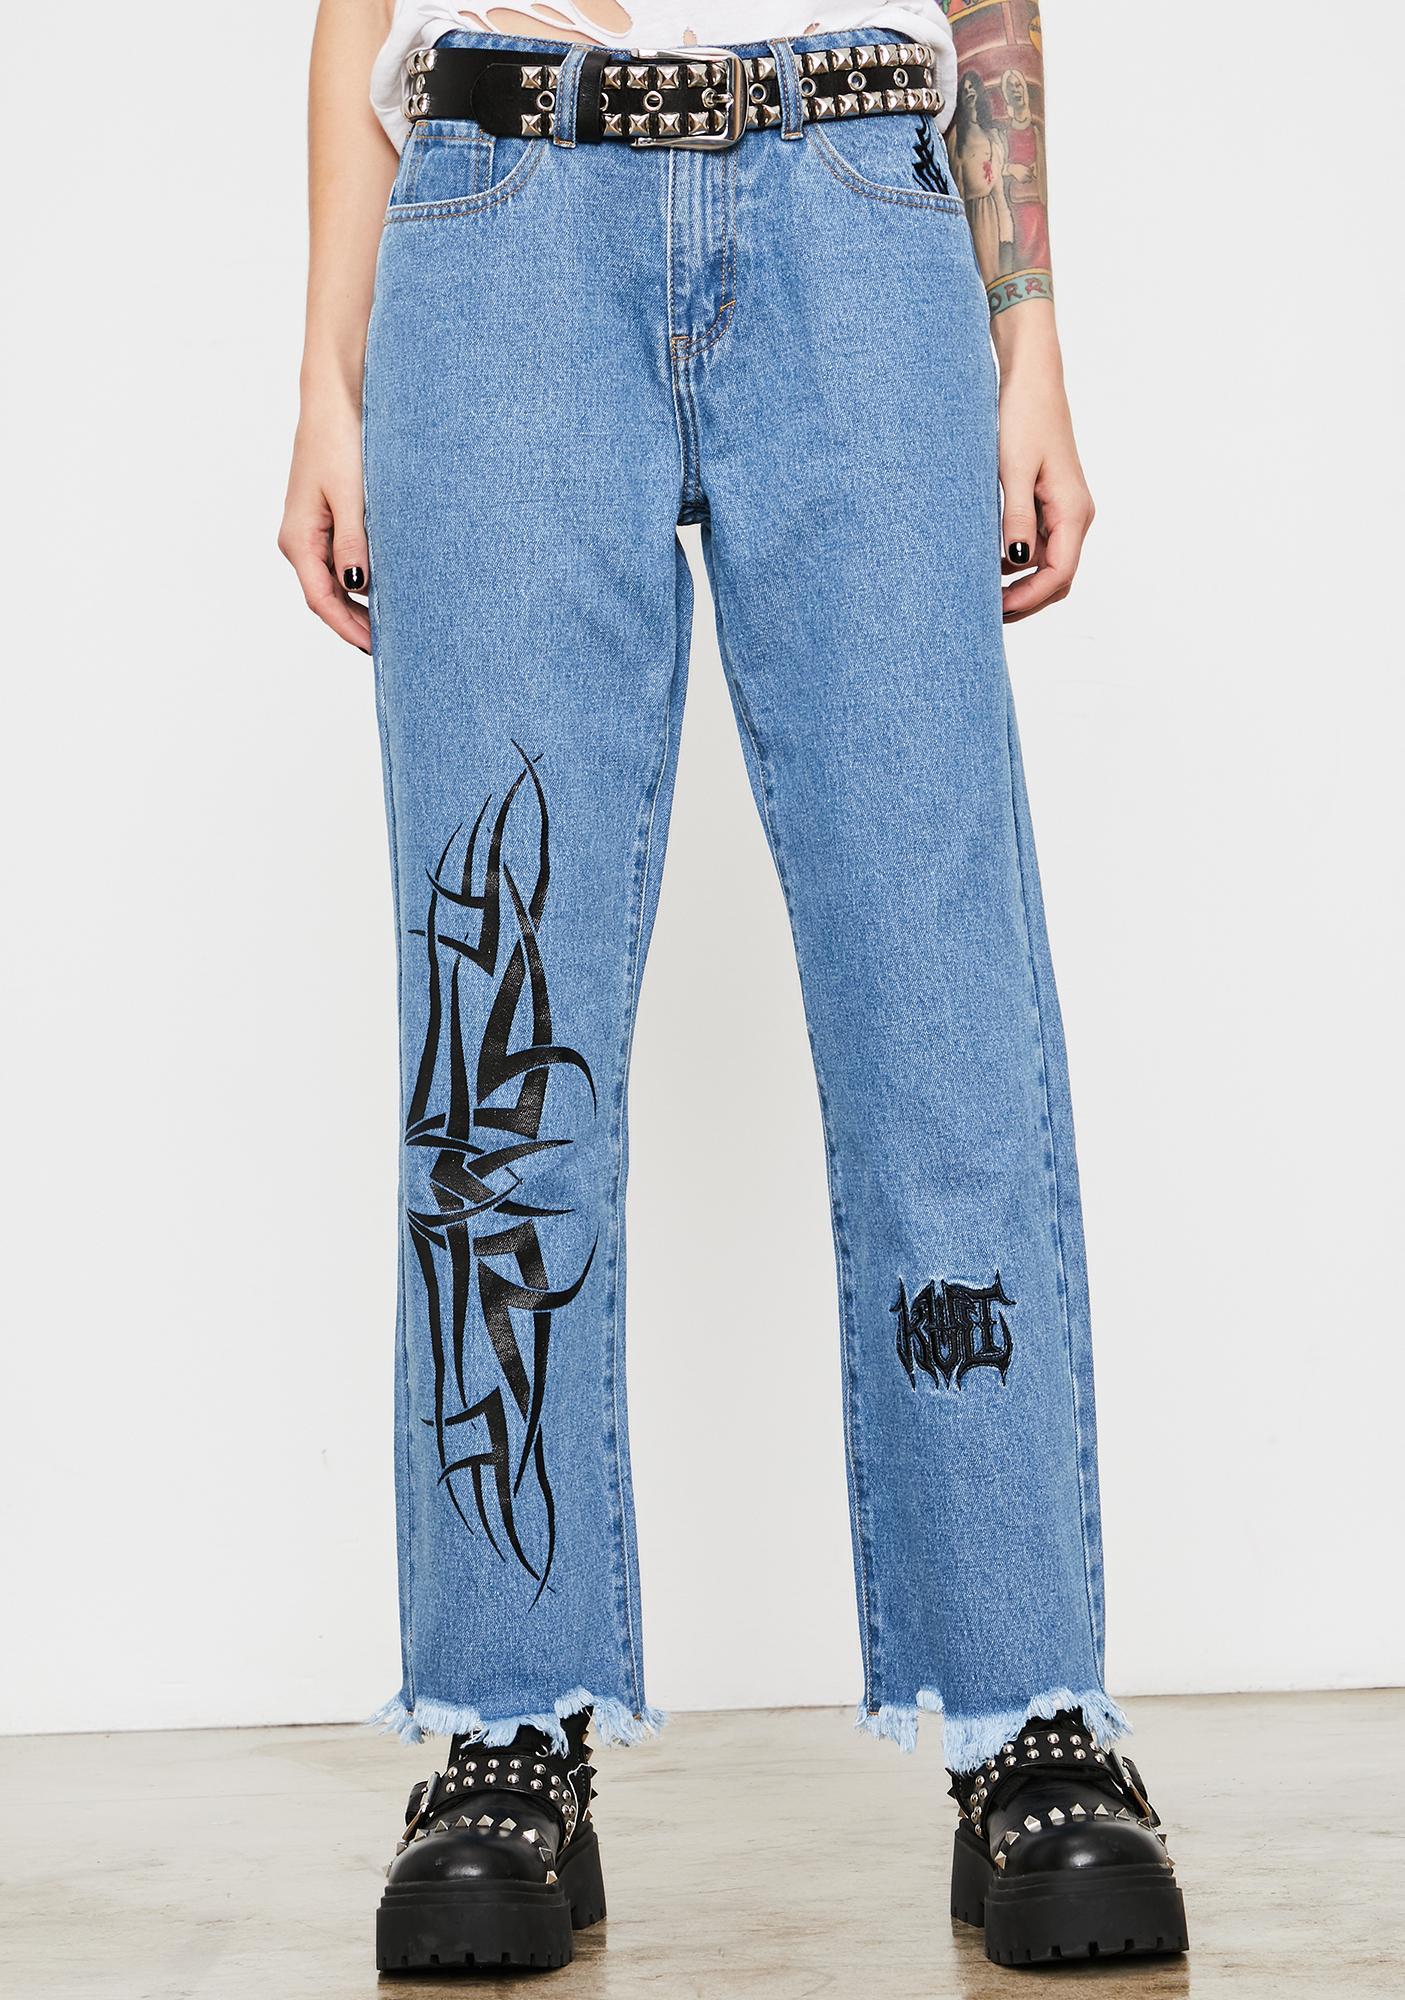 Current Mood Death Growler Distressed Denim Jeans